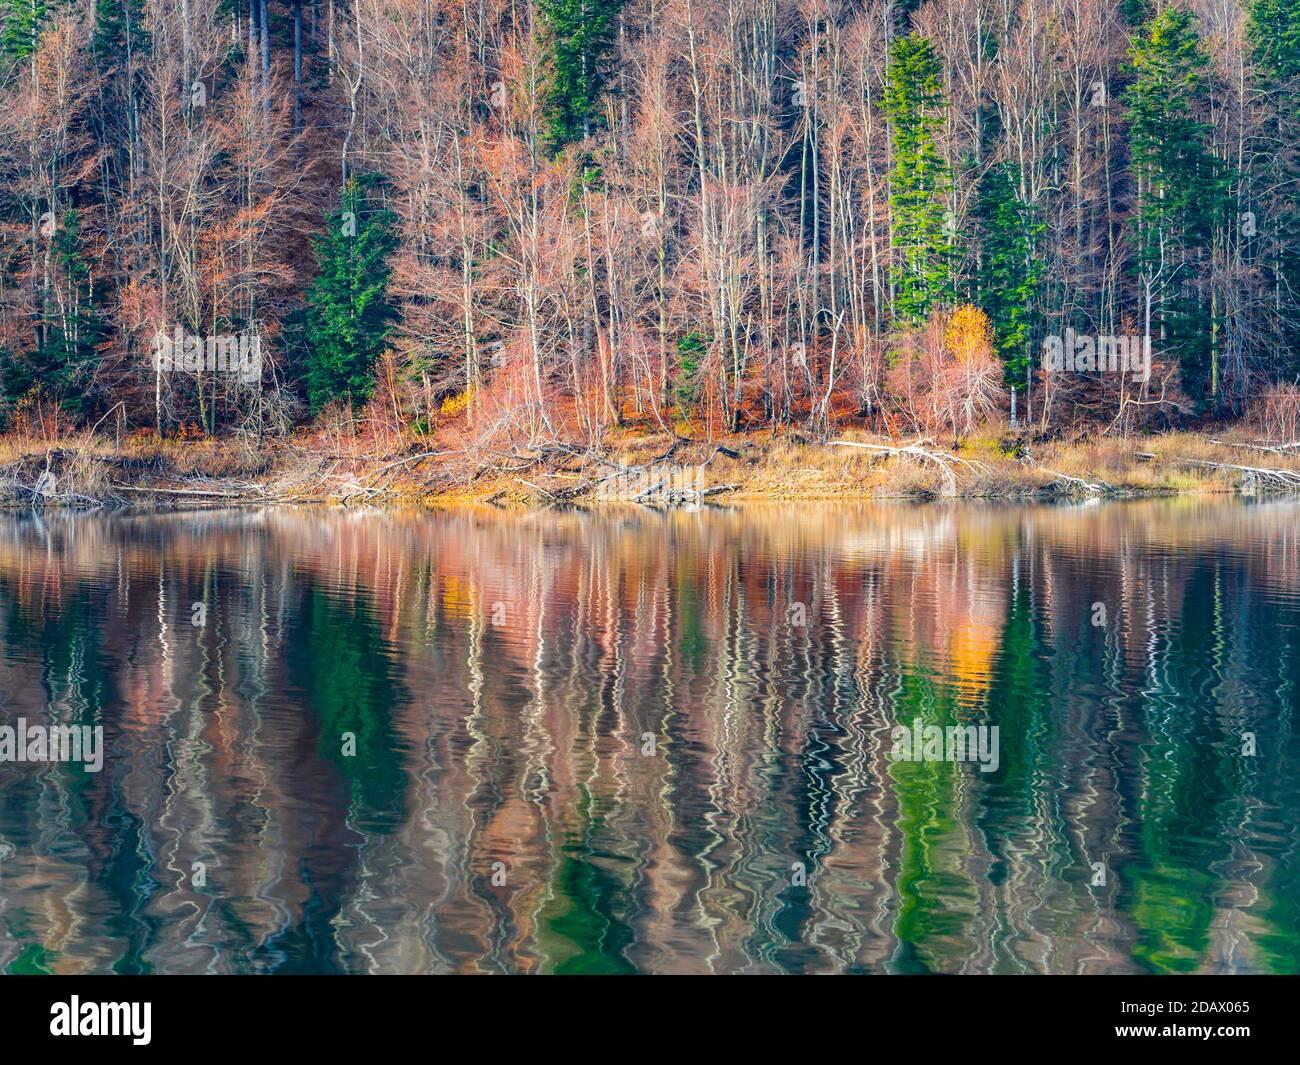 Gorgeous late Autumnal lake reflection with hint of first morning dribble waves Lokve lake Lokvarsko jezero in Croatia Europe Stock Photo